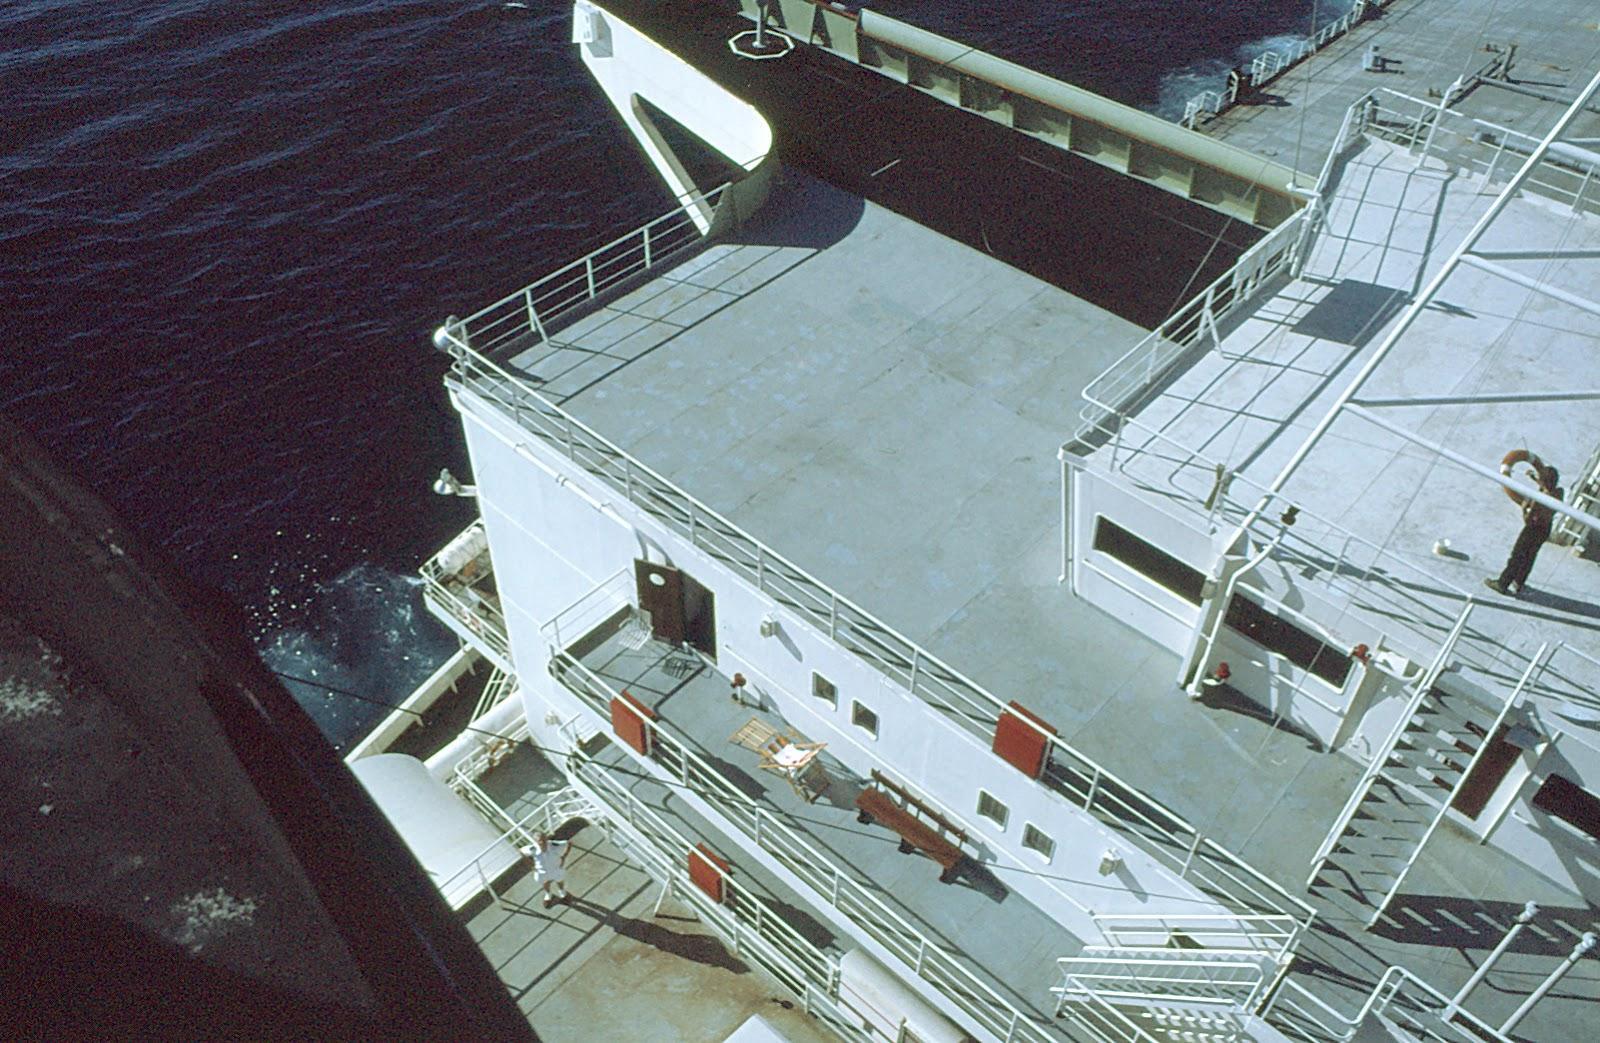 39 zien en weten 39 lepton s s shell tankers b v deel 1 8 for Helmers accommodatie en interieur bv